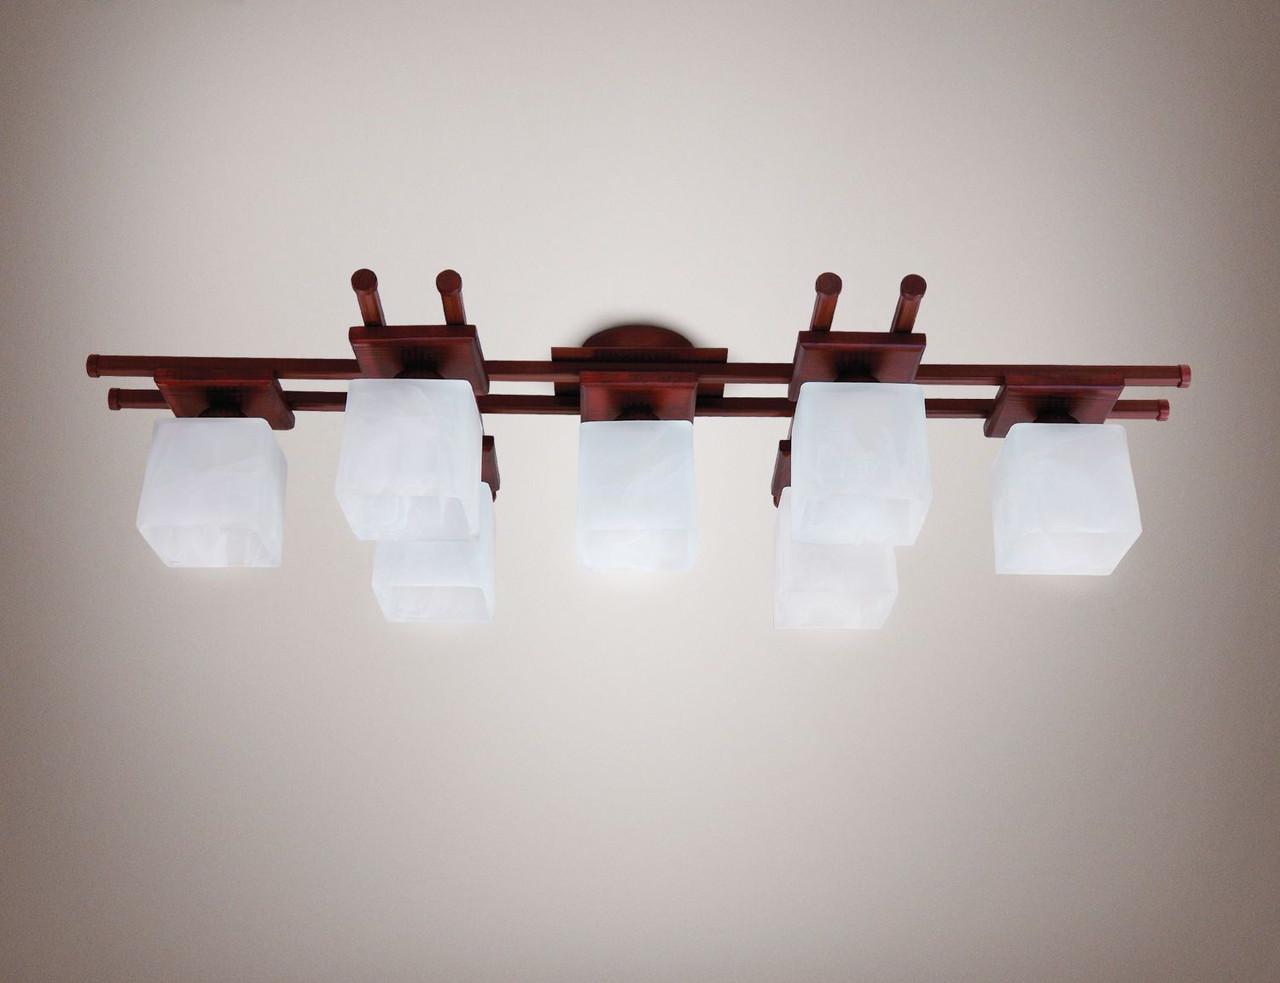 Люстра 7-ми лампова, металева, дерев'яна, зал 14677